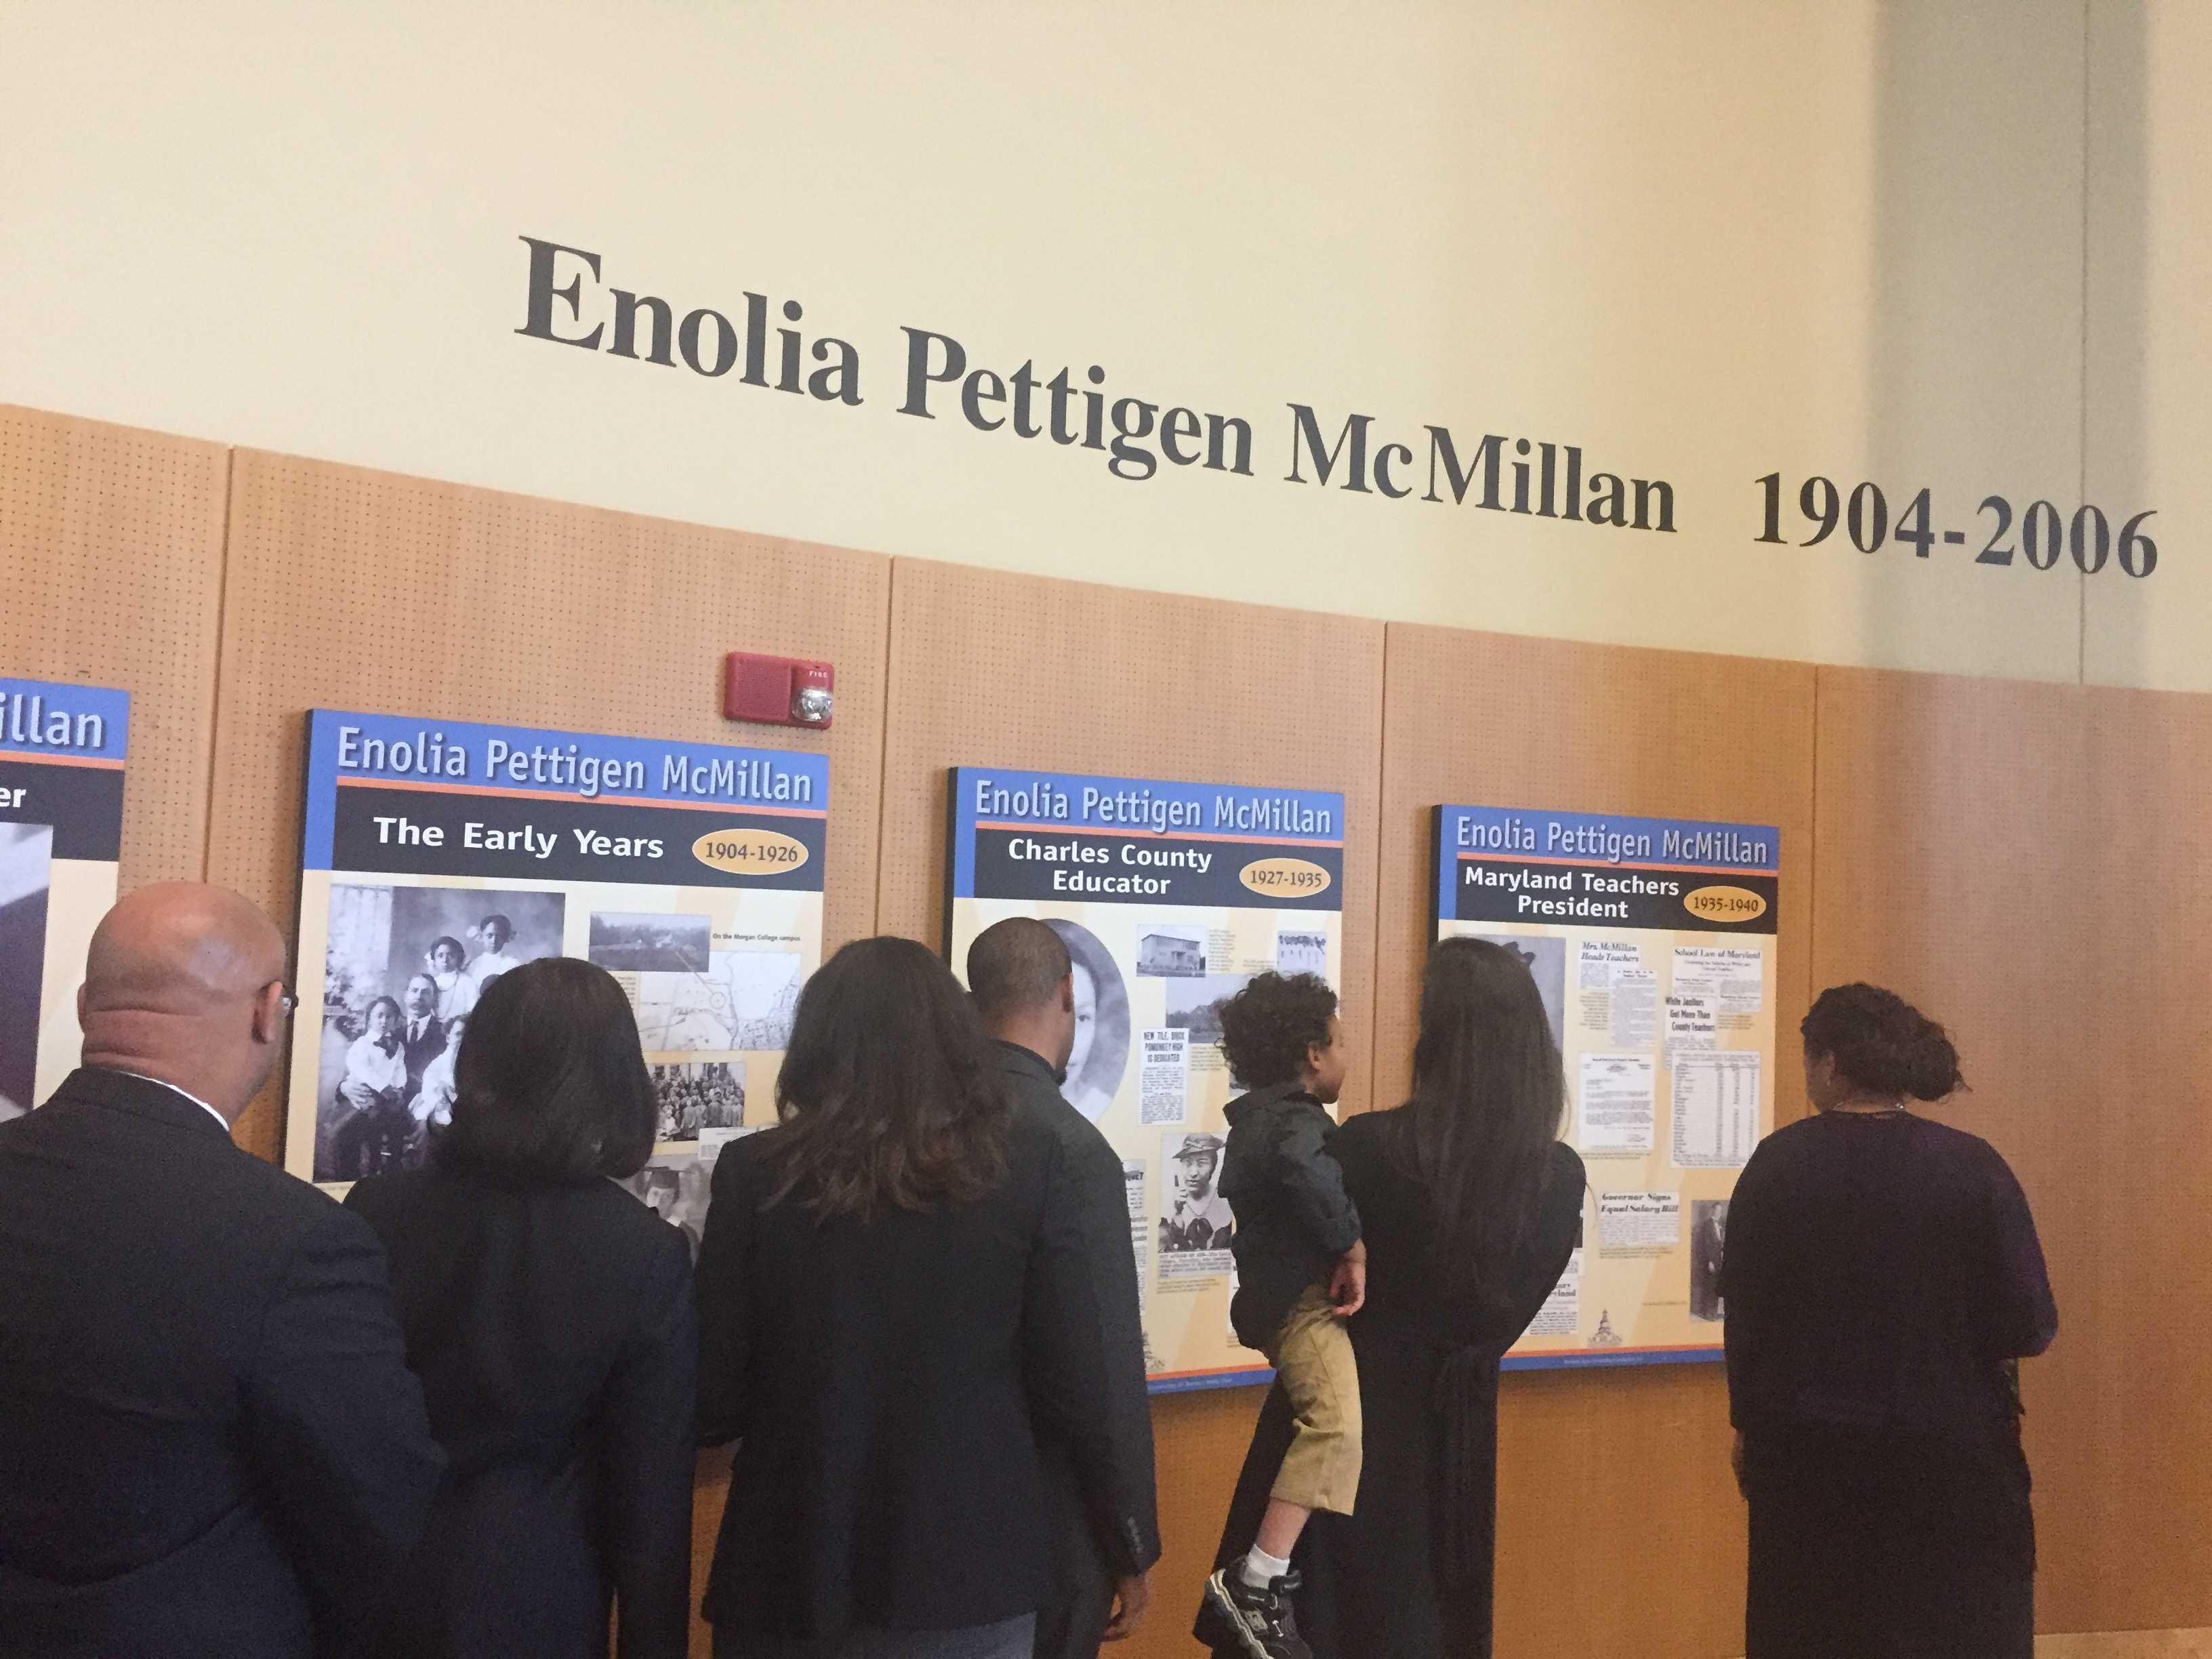 Enoila Pettigen MCMillian exhibit. Photo credit: Devon Ashby.